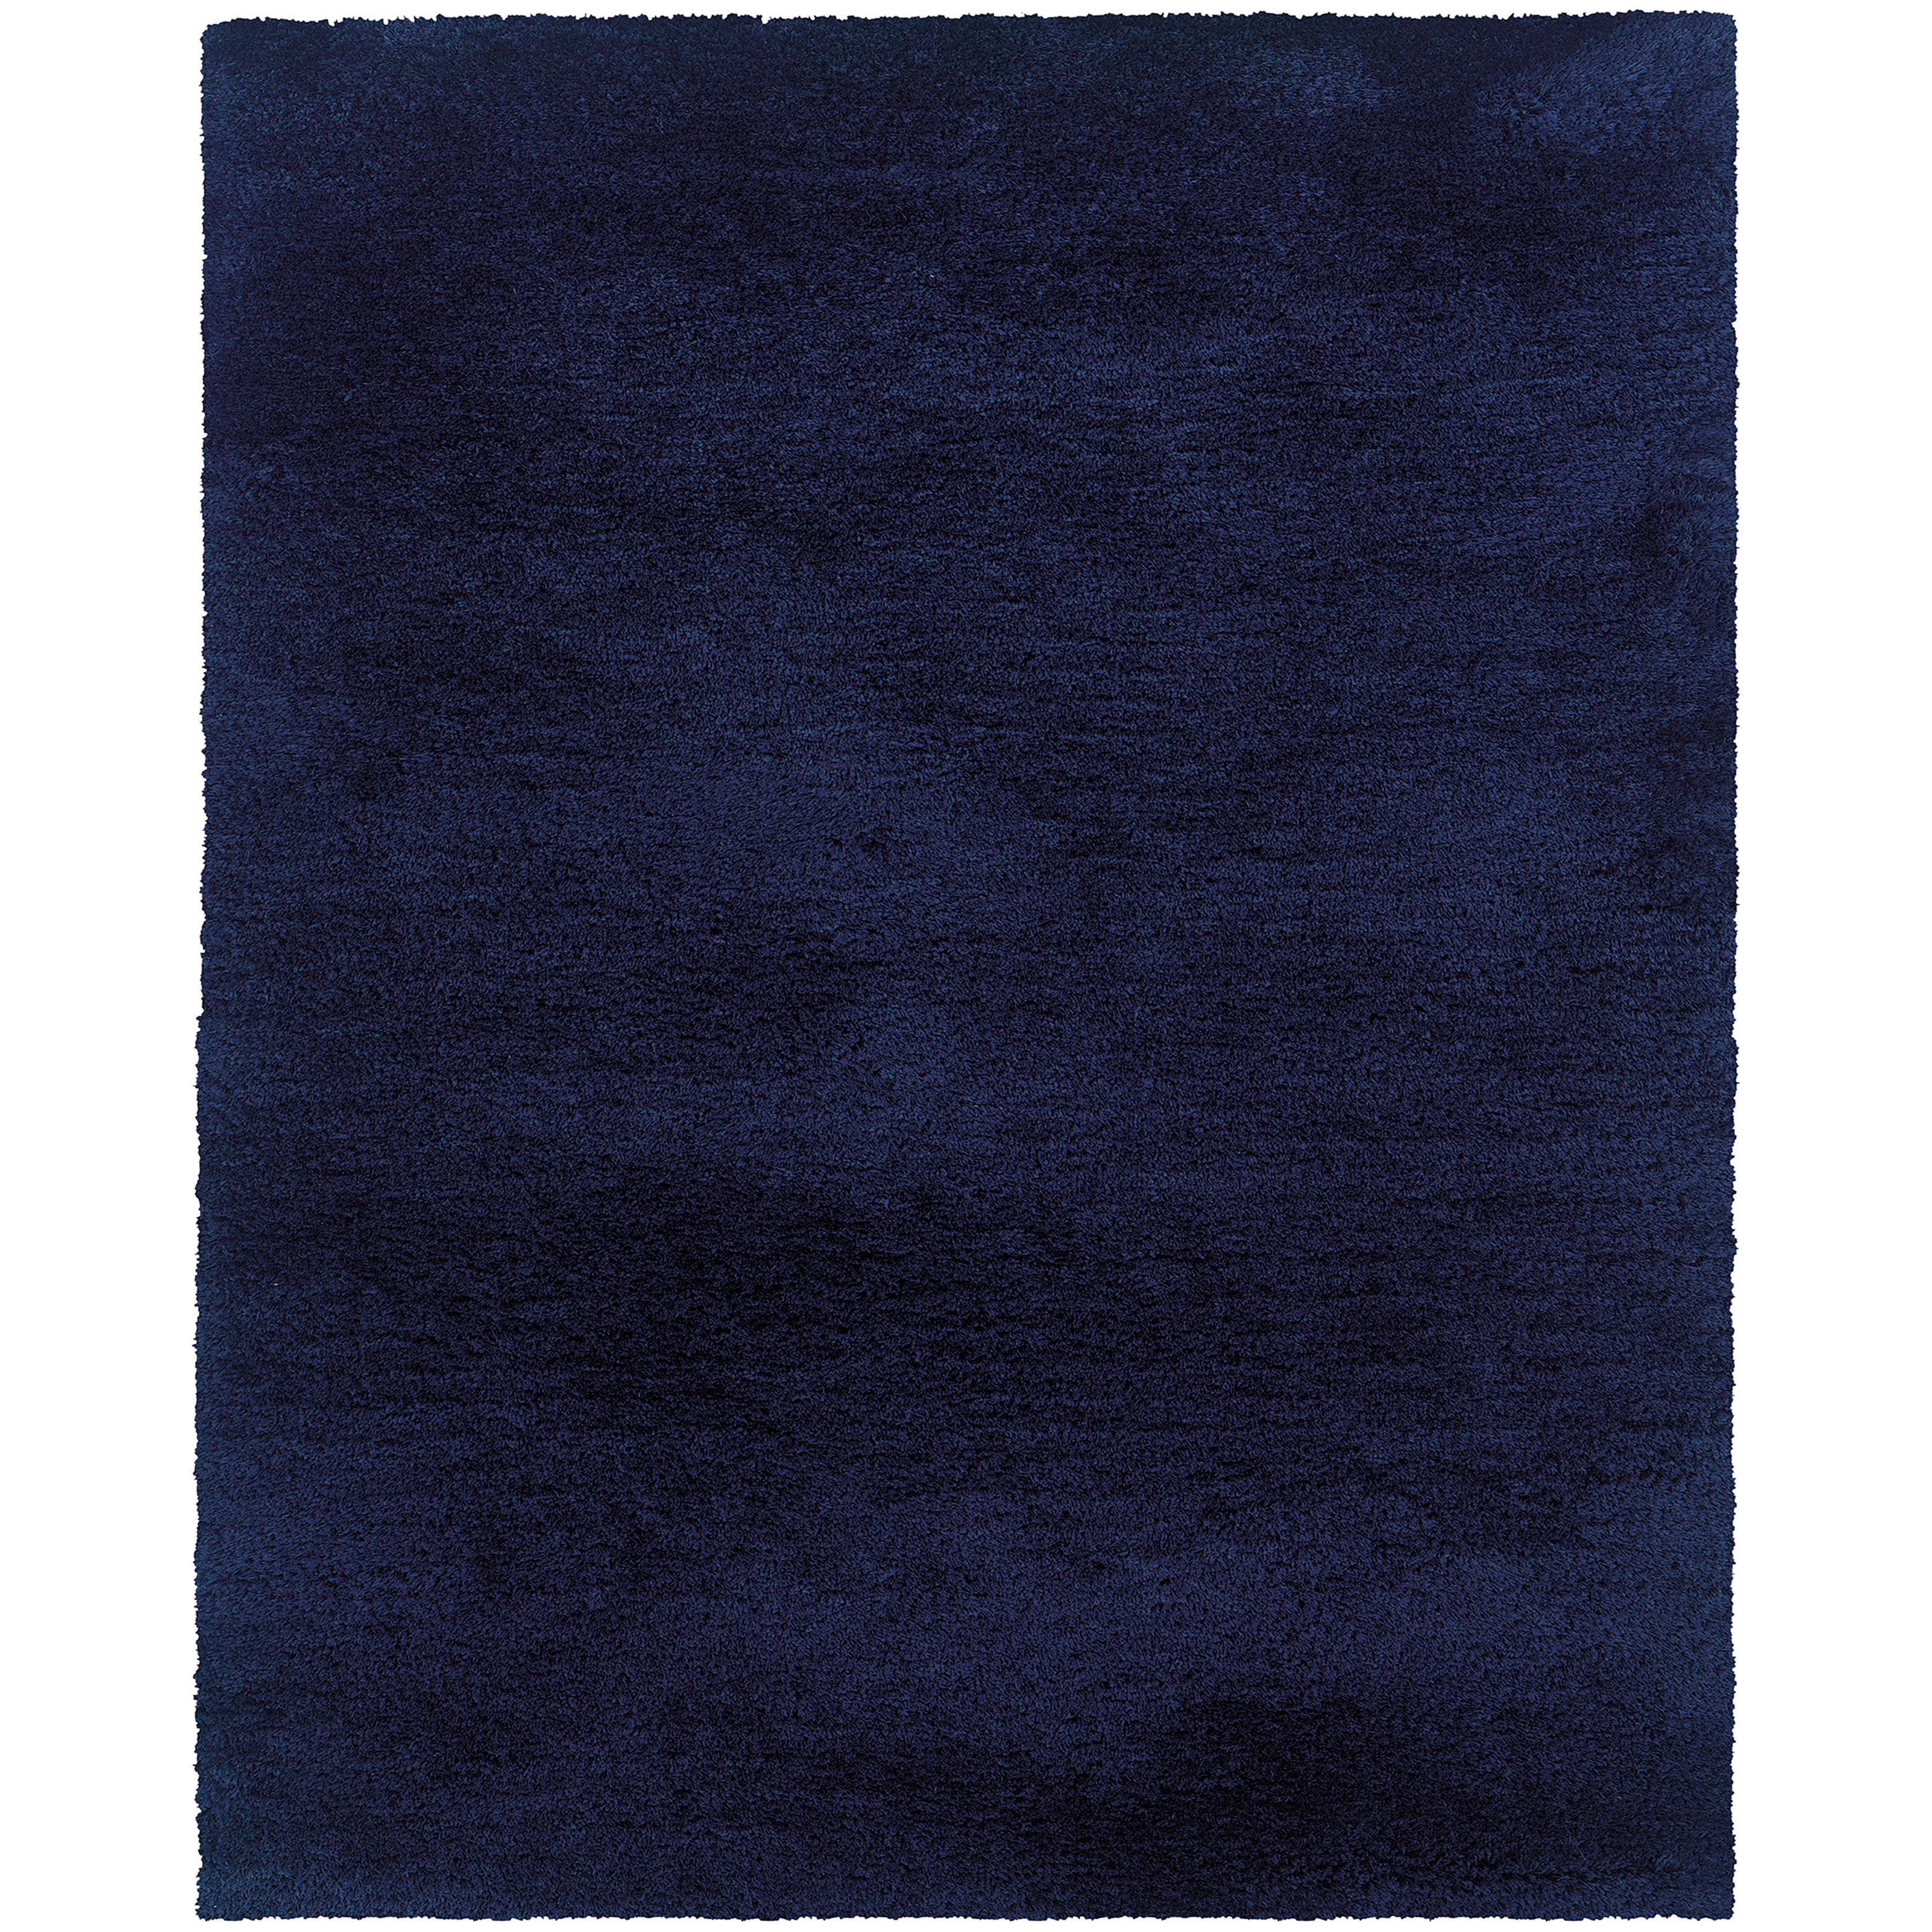 "Oriental Weavers Cosmo 10' 0"" X 13' 0"" Rug - Item Number: C81106305396ST"